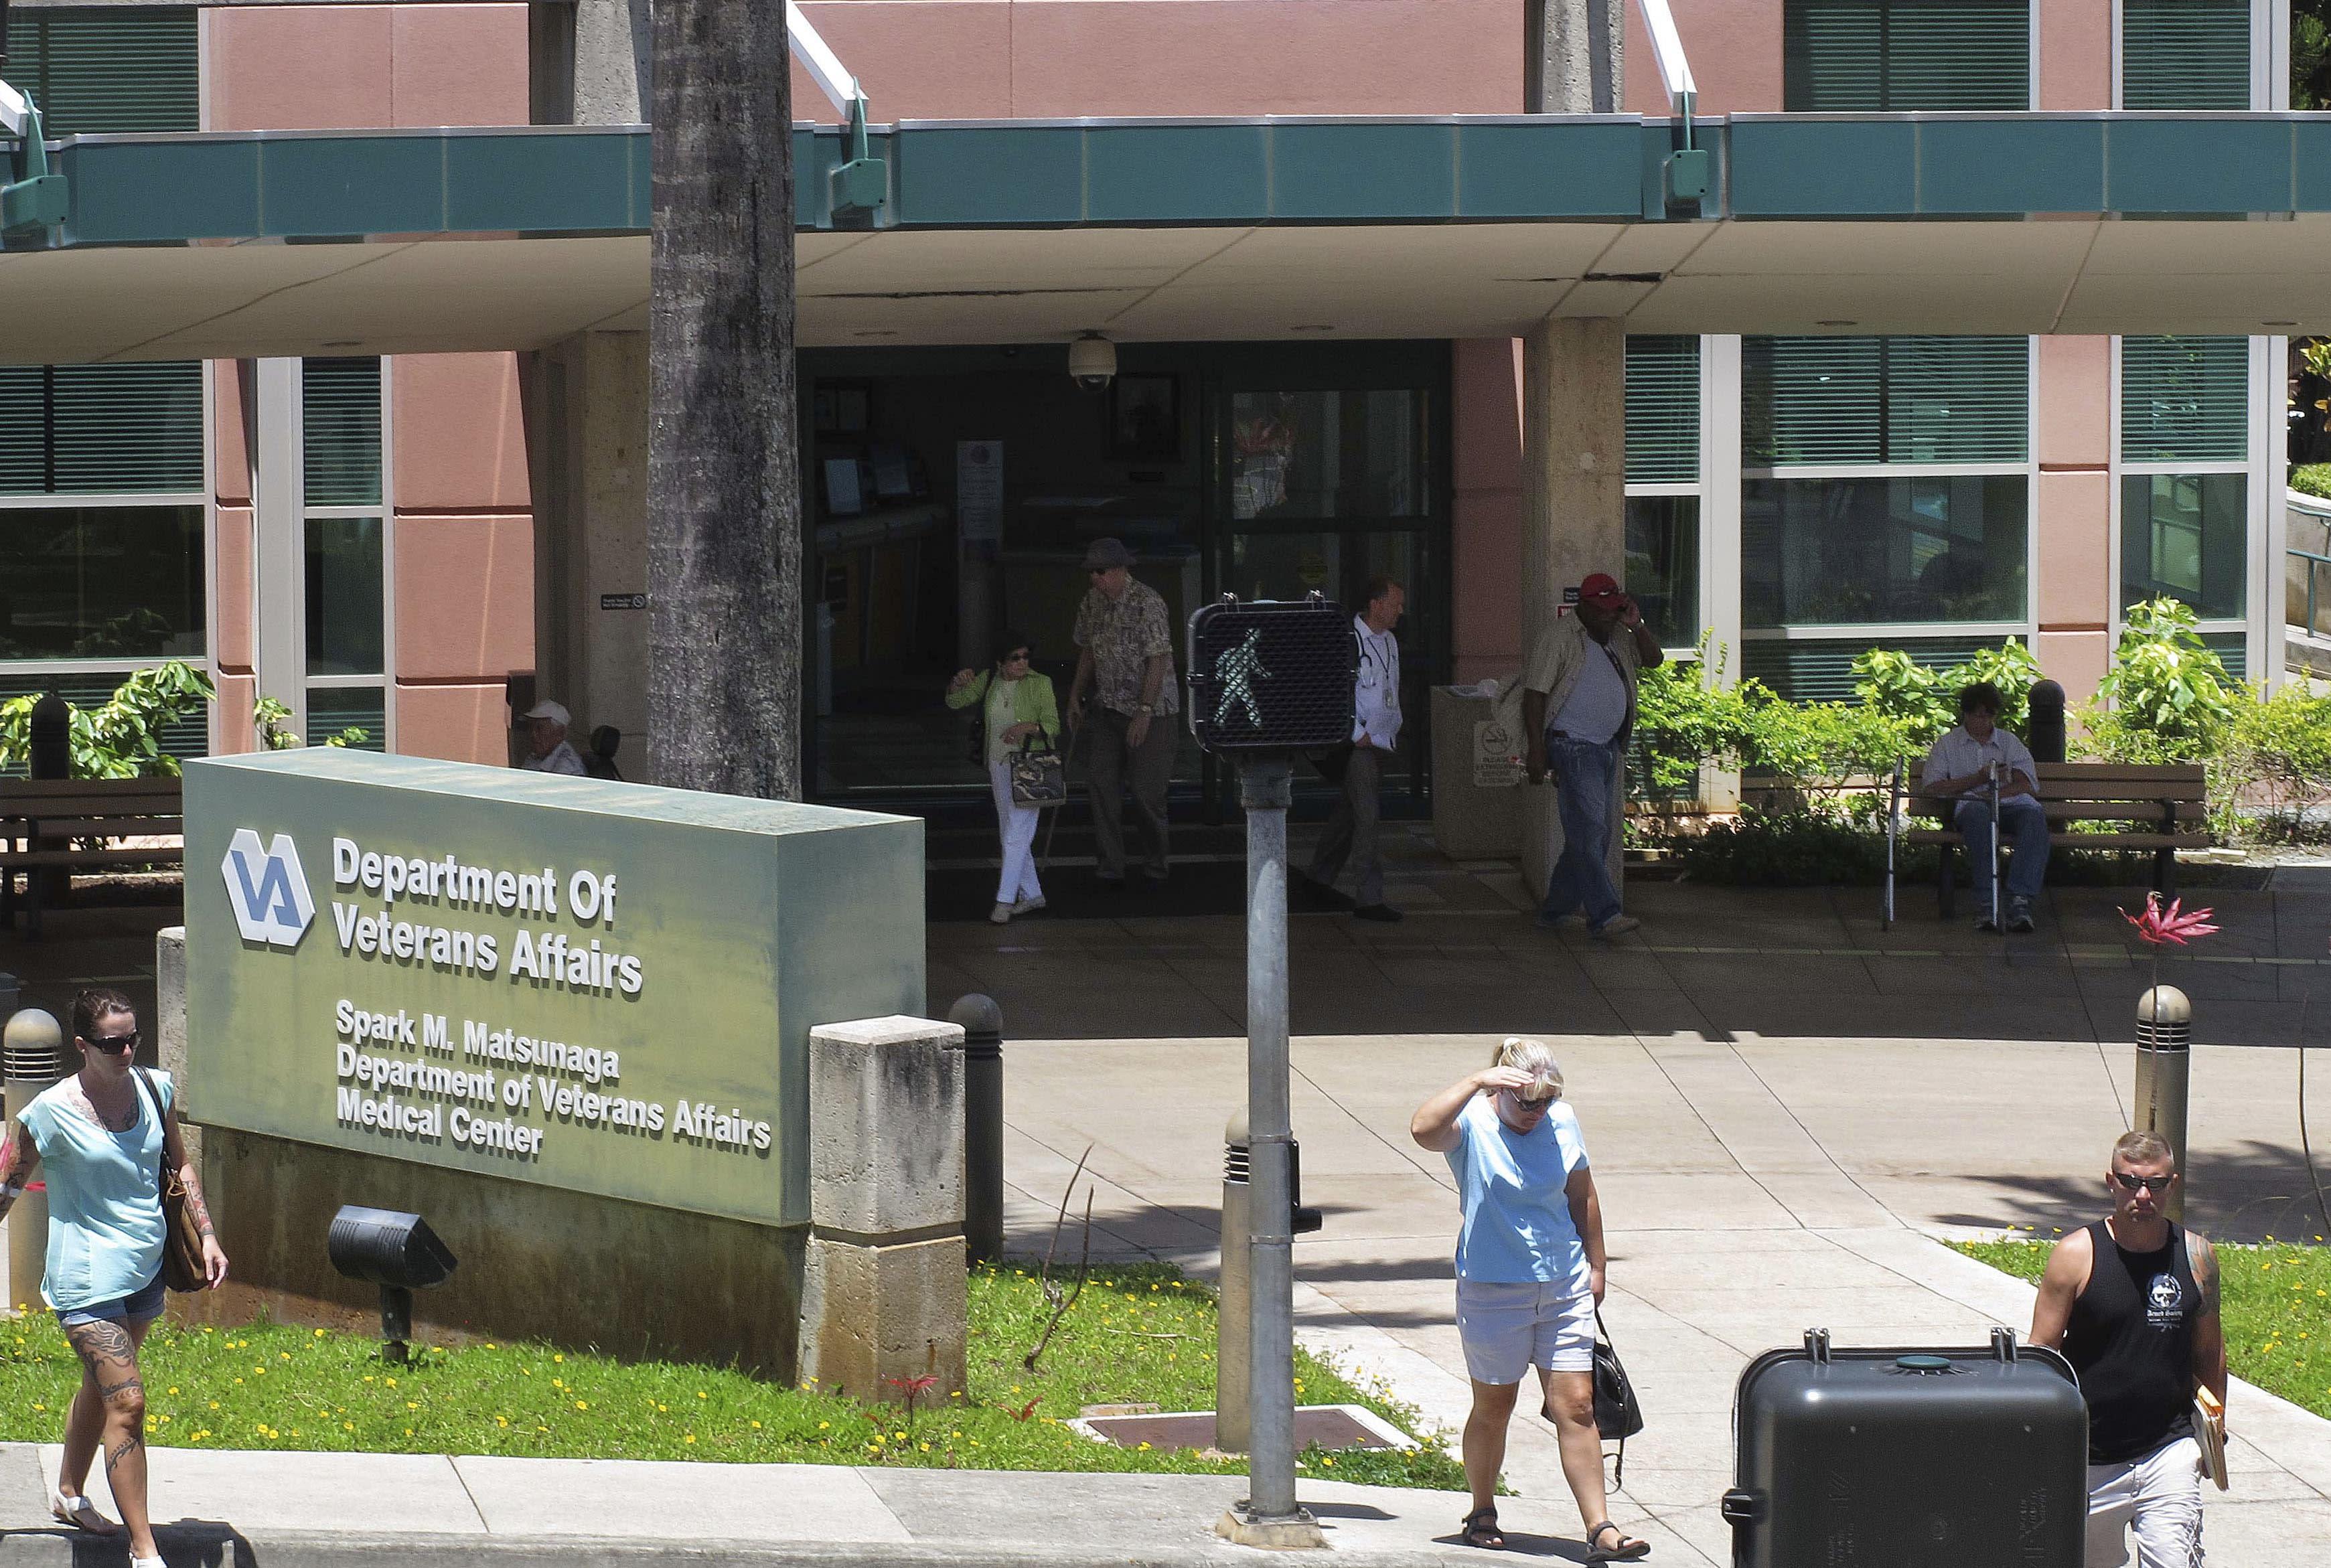 Report: Hawaii supervisor manipulated veterans' benefit data